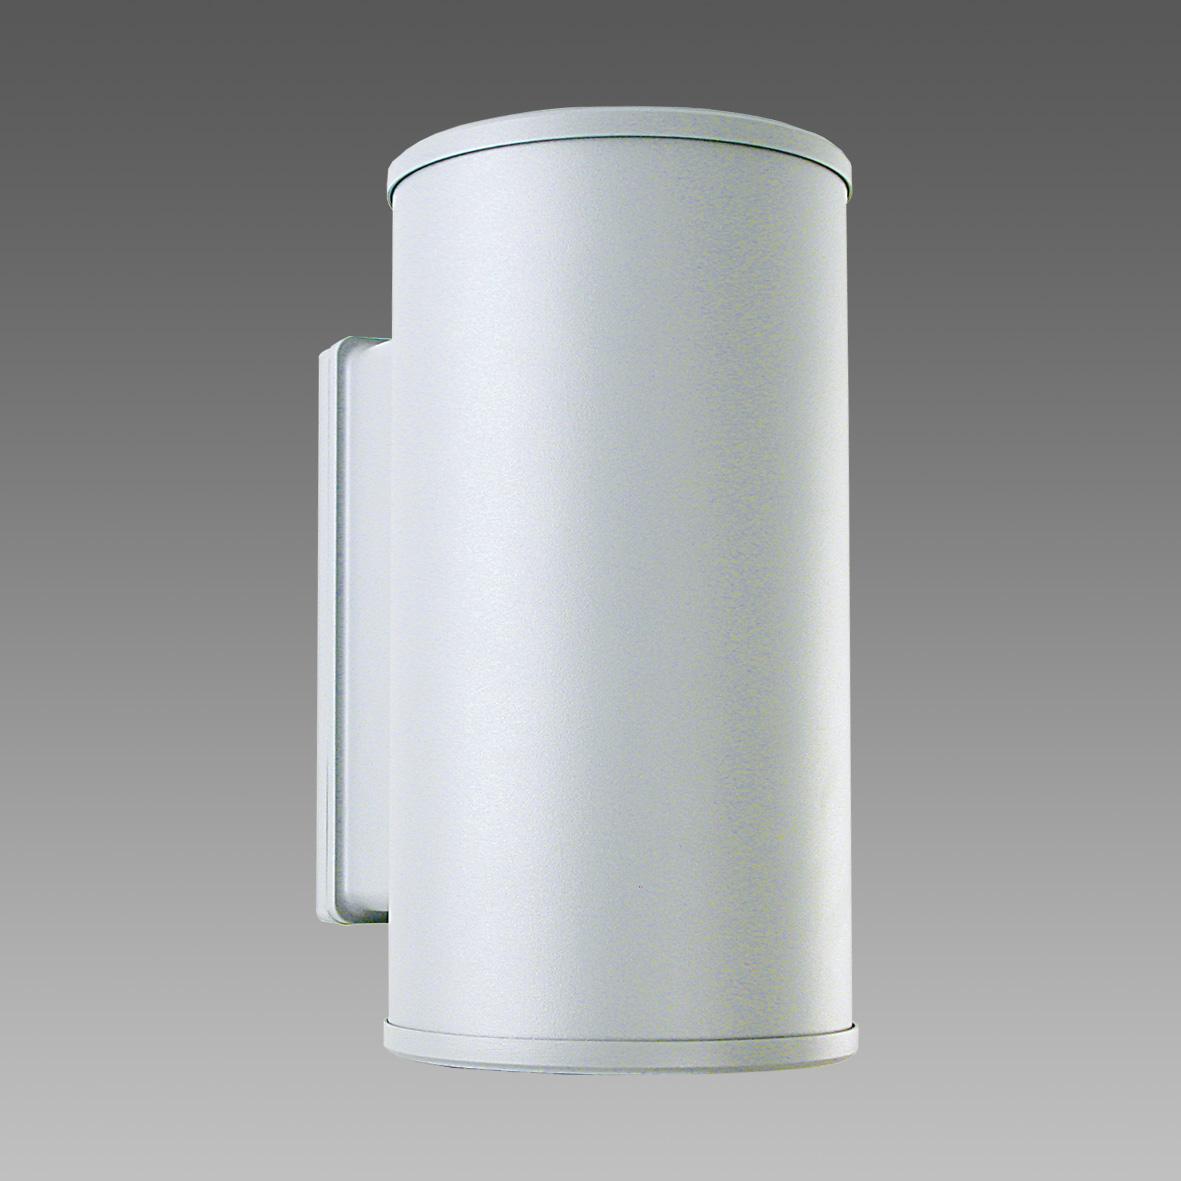 CILINDRO1 1290 CDMT-150+FLC23 CNRL G9007